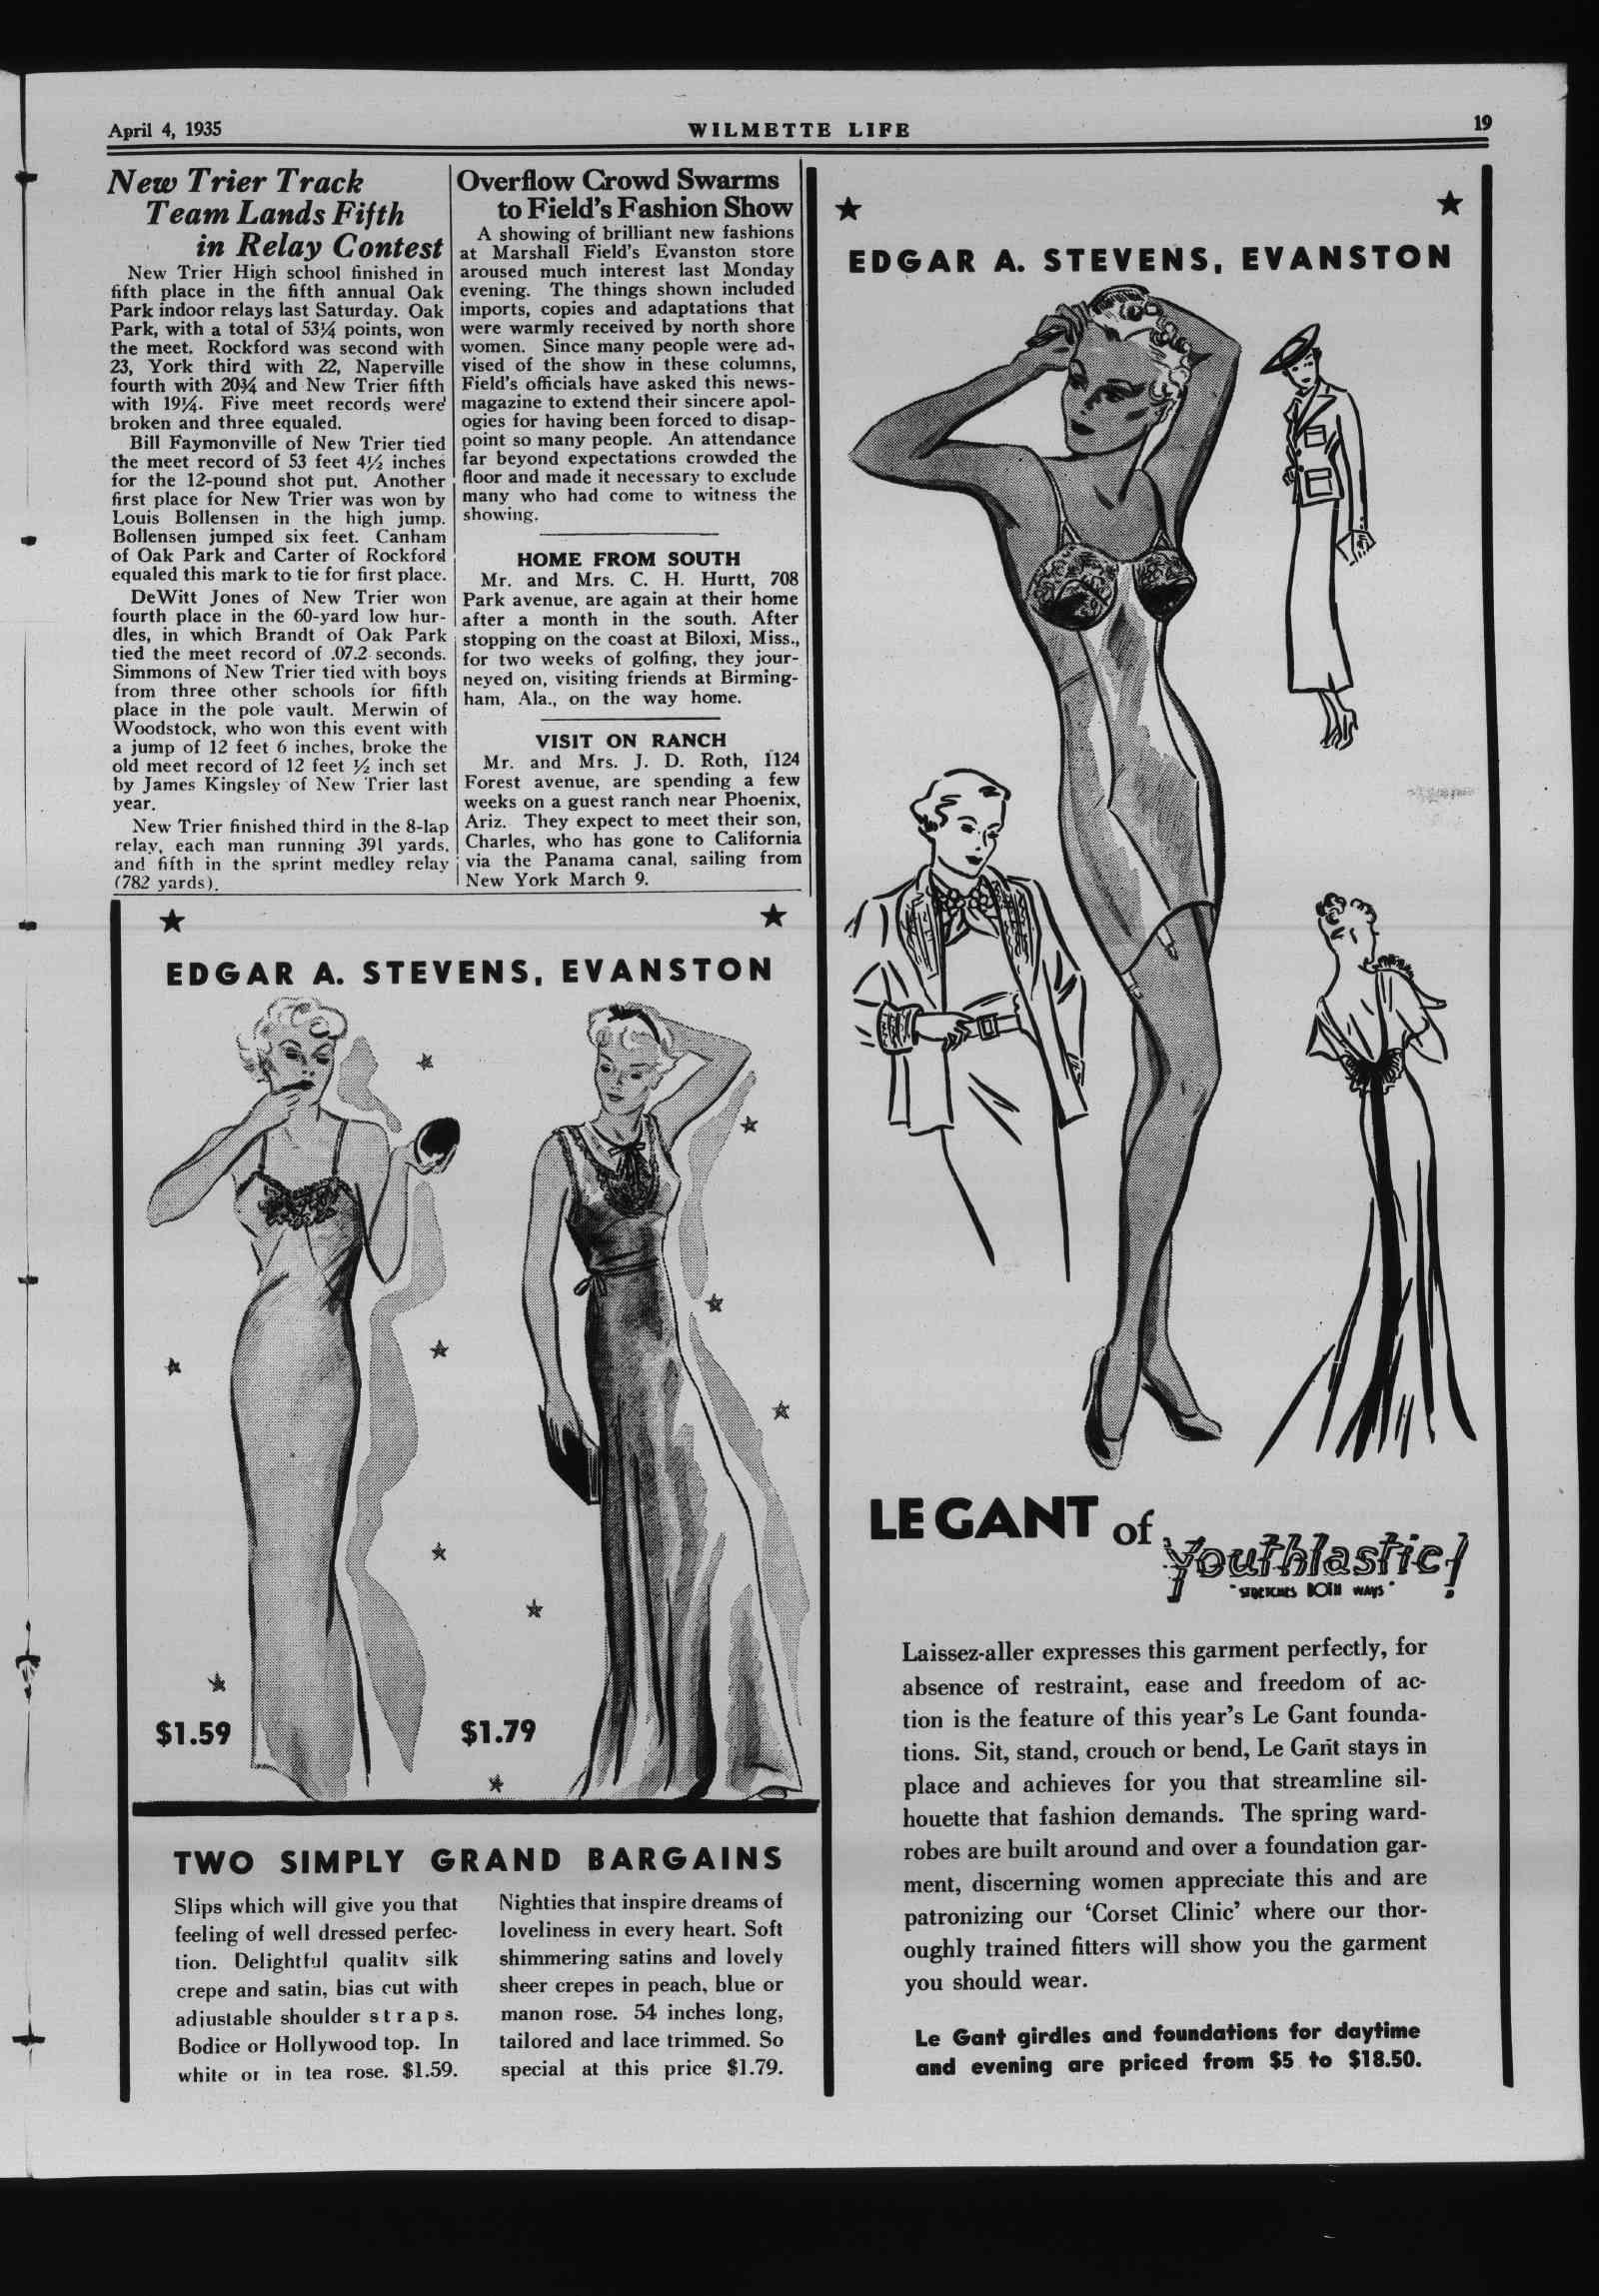 Wilmette Life (Wilmette, Illinois), 4 Apr 1935